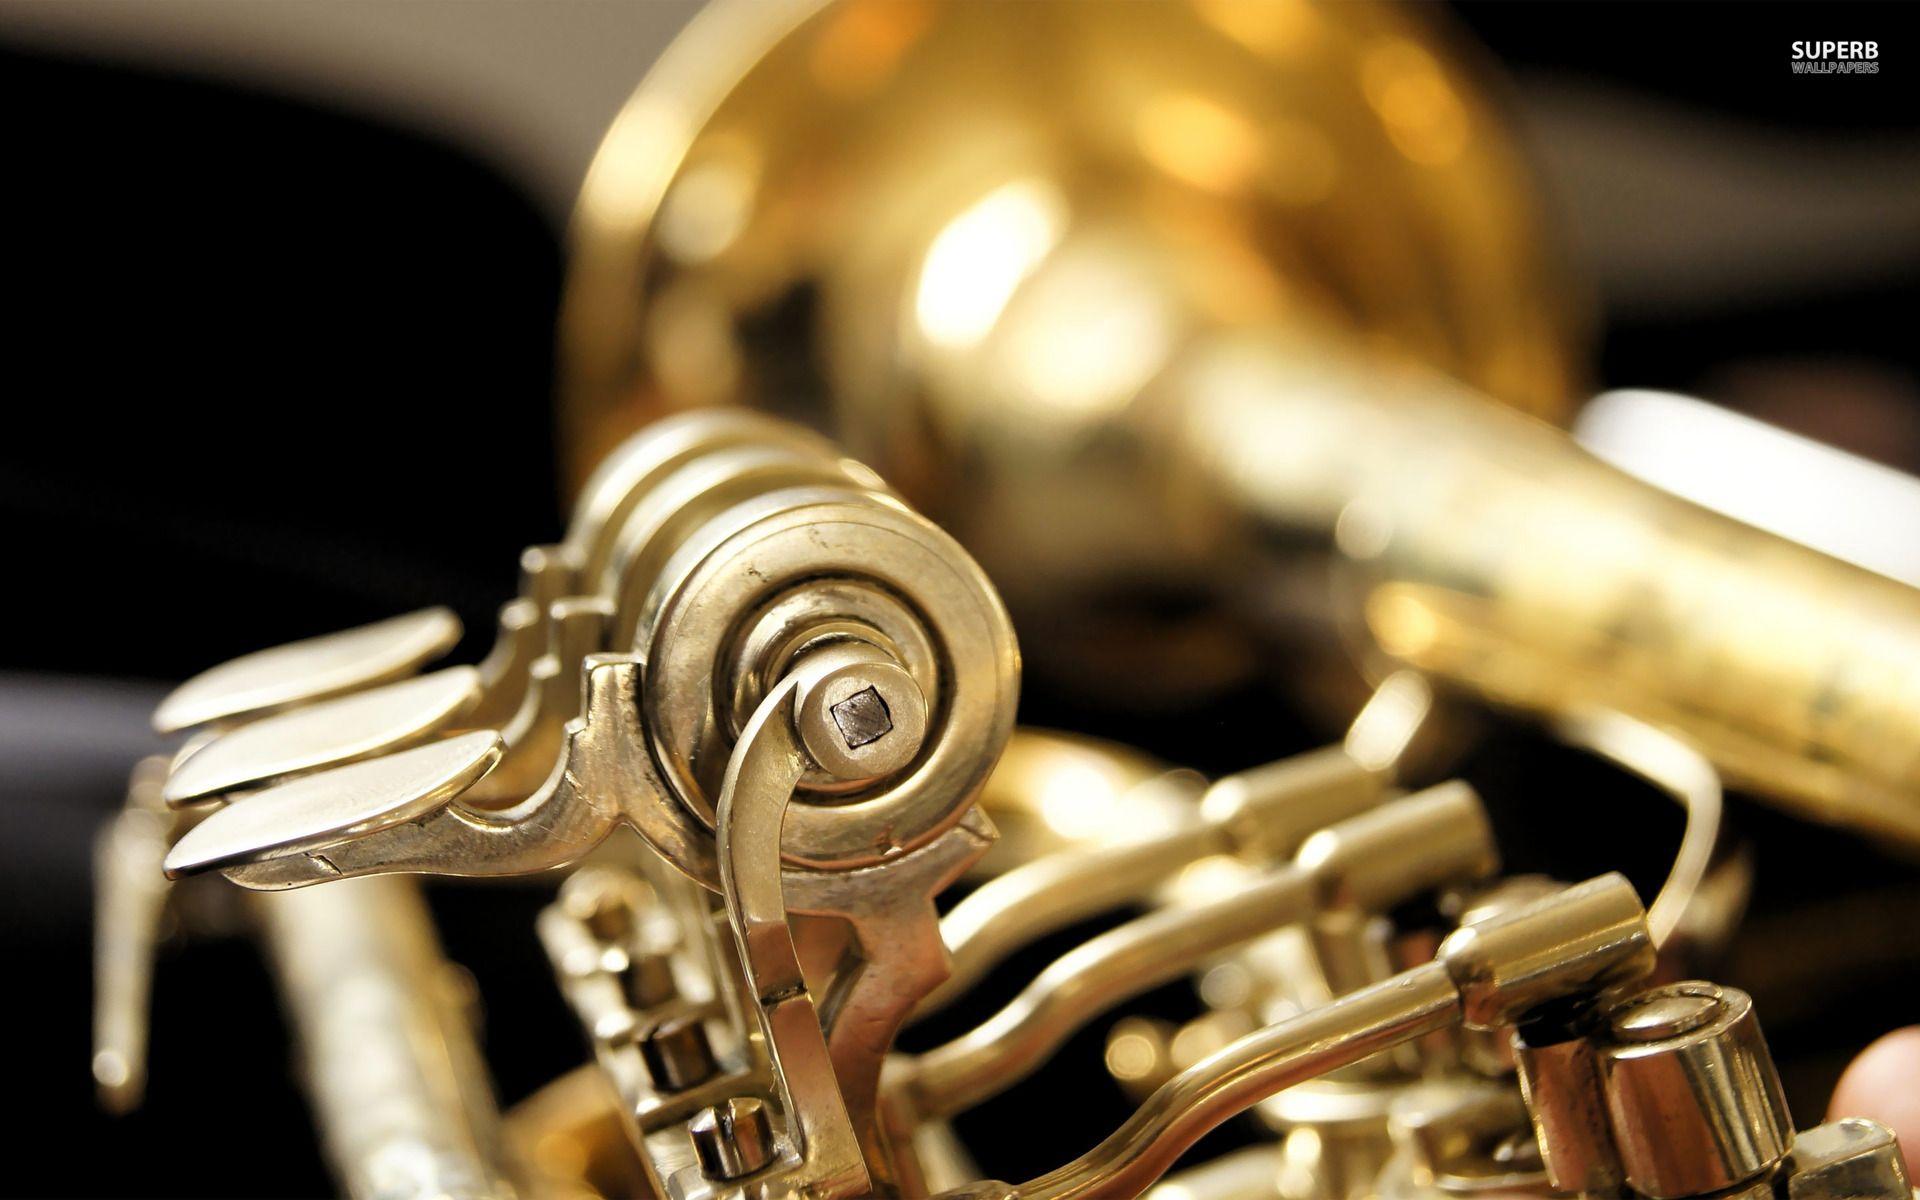 Image For Jazz Trumpet Wallpaper Cool Hd Musical Instruments Trombone Music Jazz Trumpet